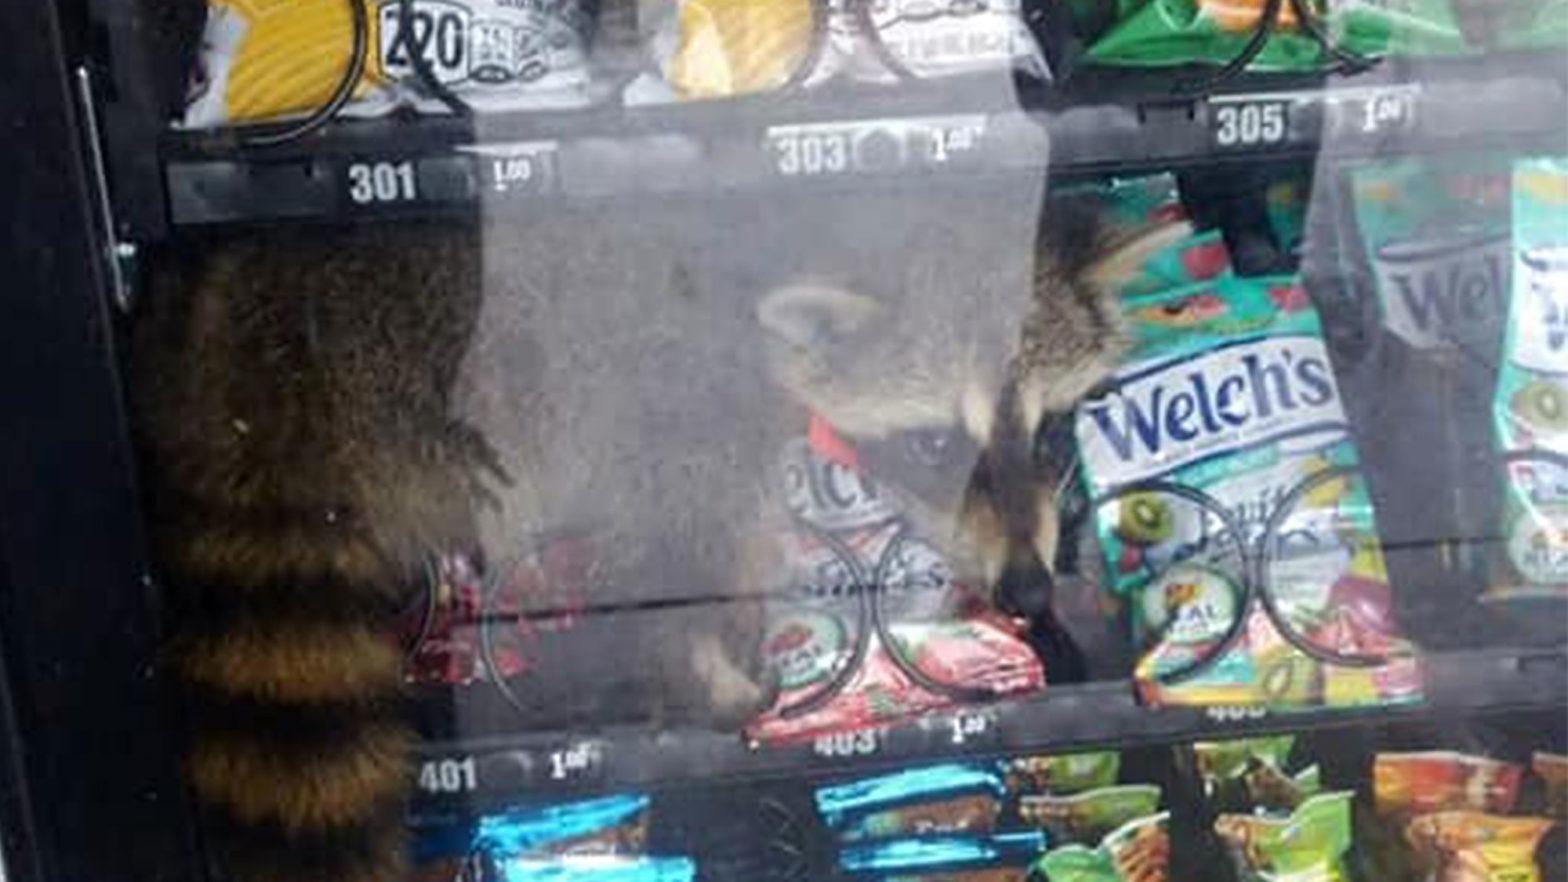 Raccoon Caught Ransacking Vending